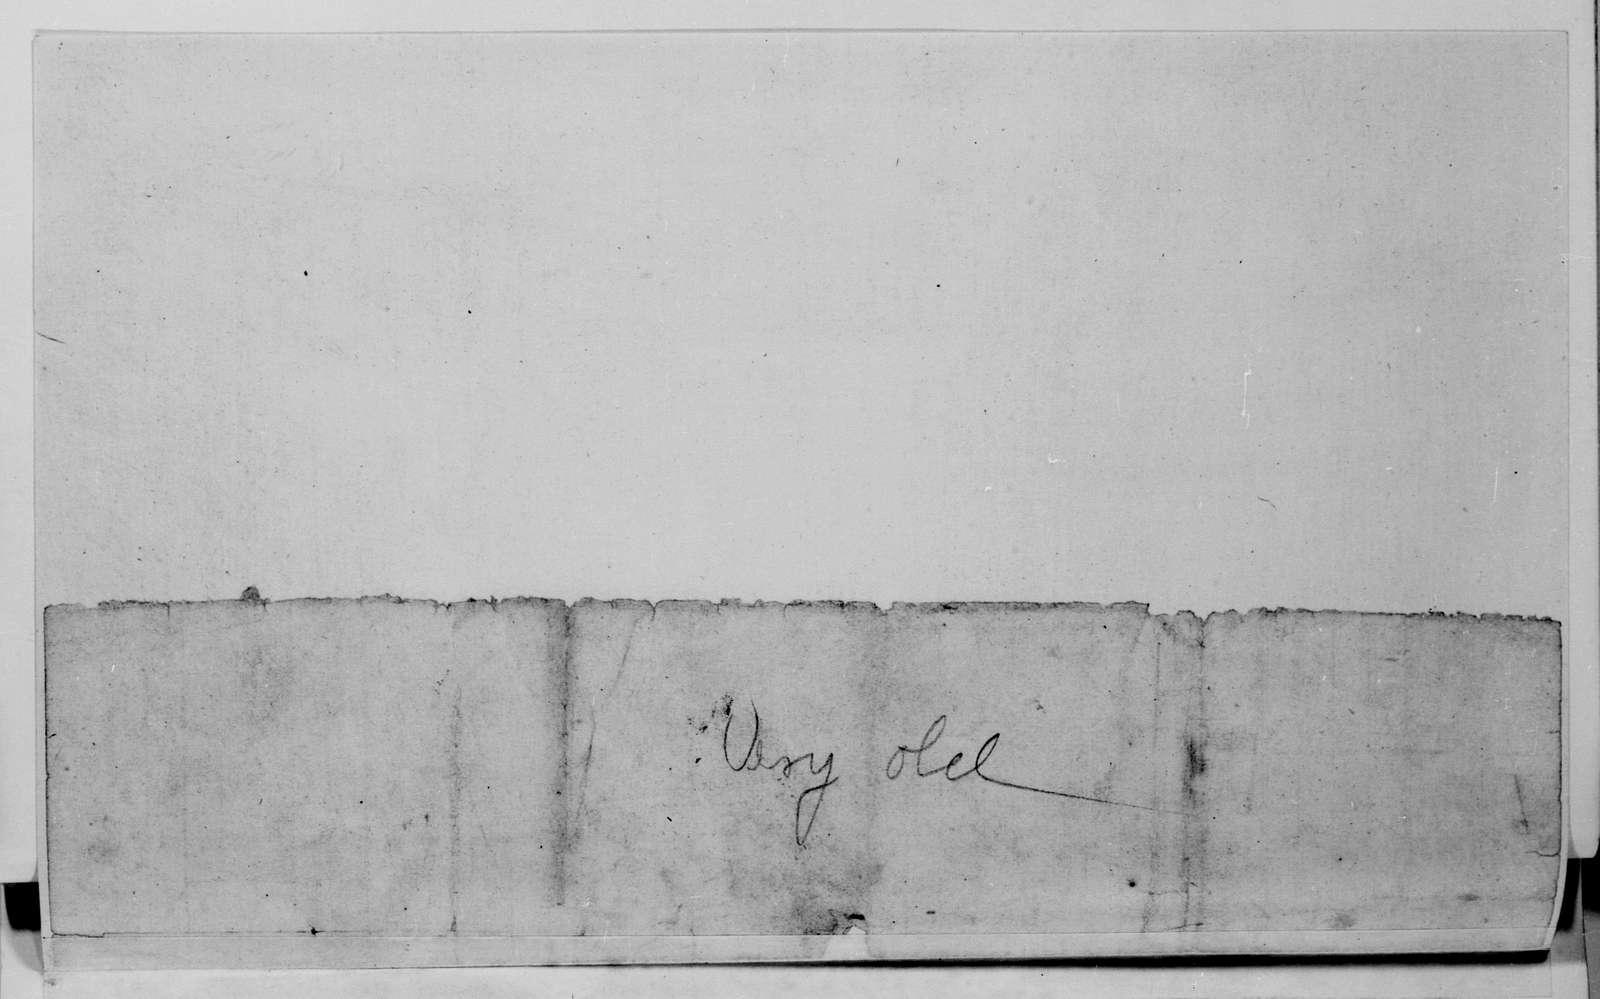 Alexander Hamilton Stephens Papers: General Correspondence, 1784-1886; 1784, May 17-1846, Aug. 18